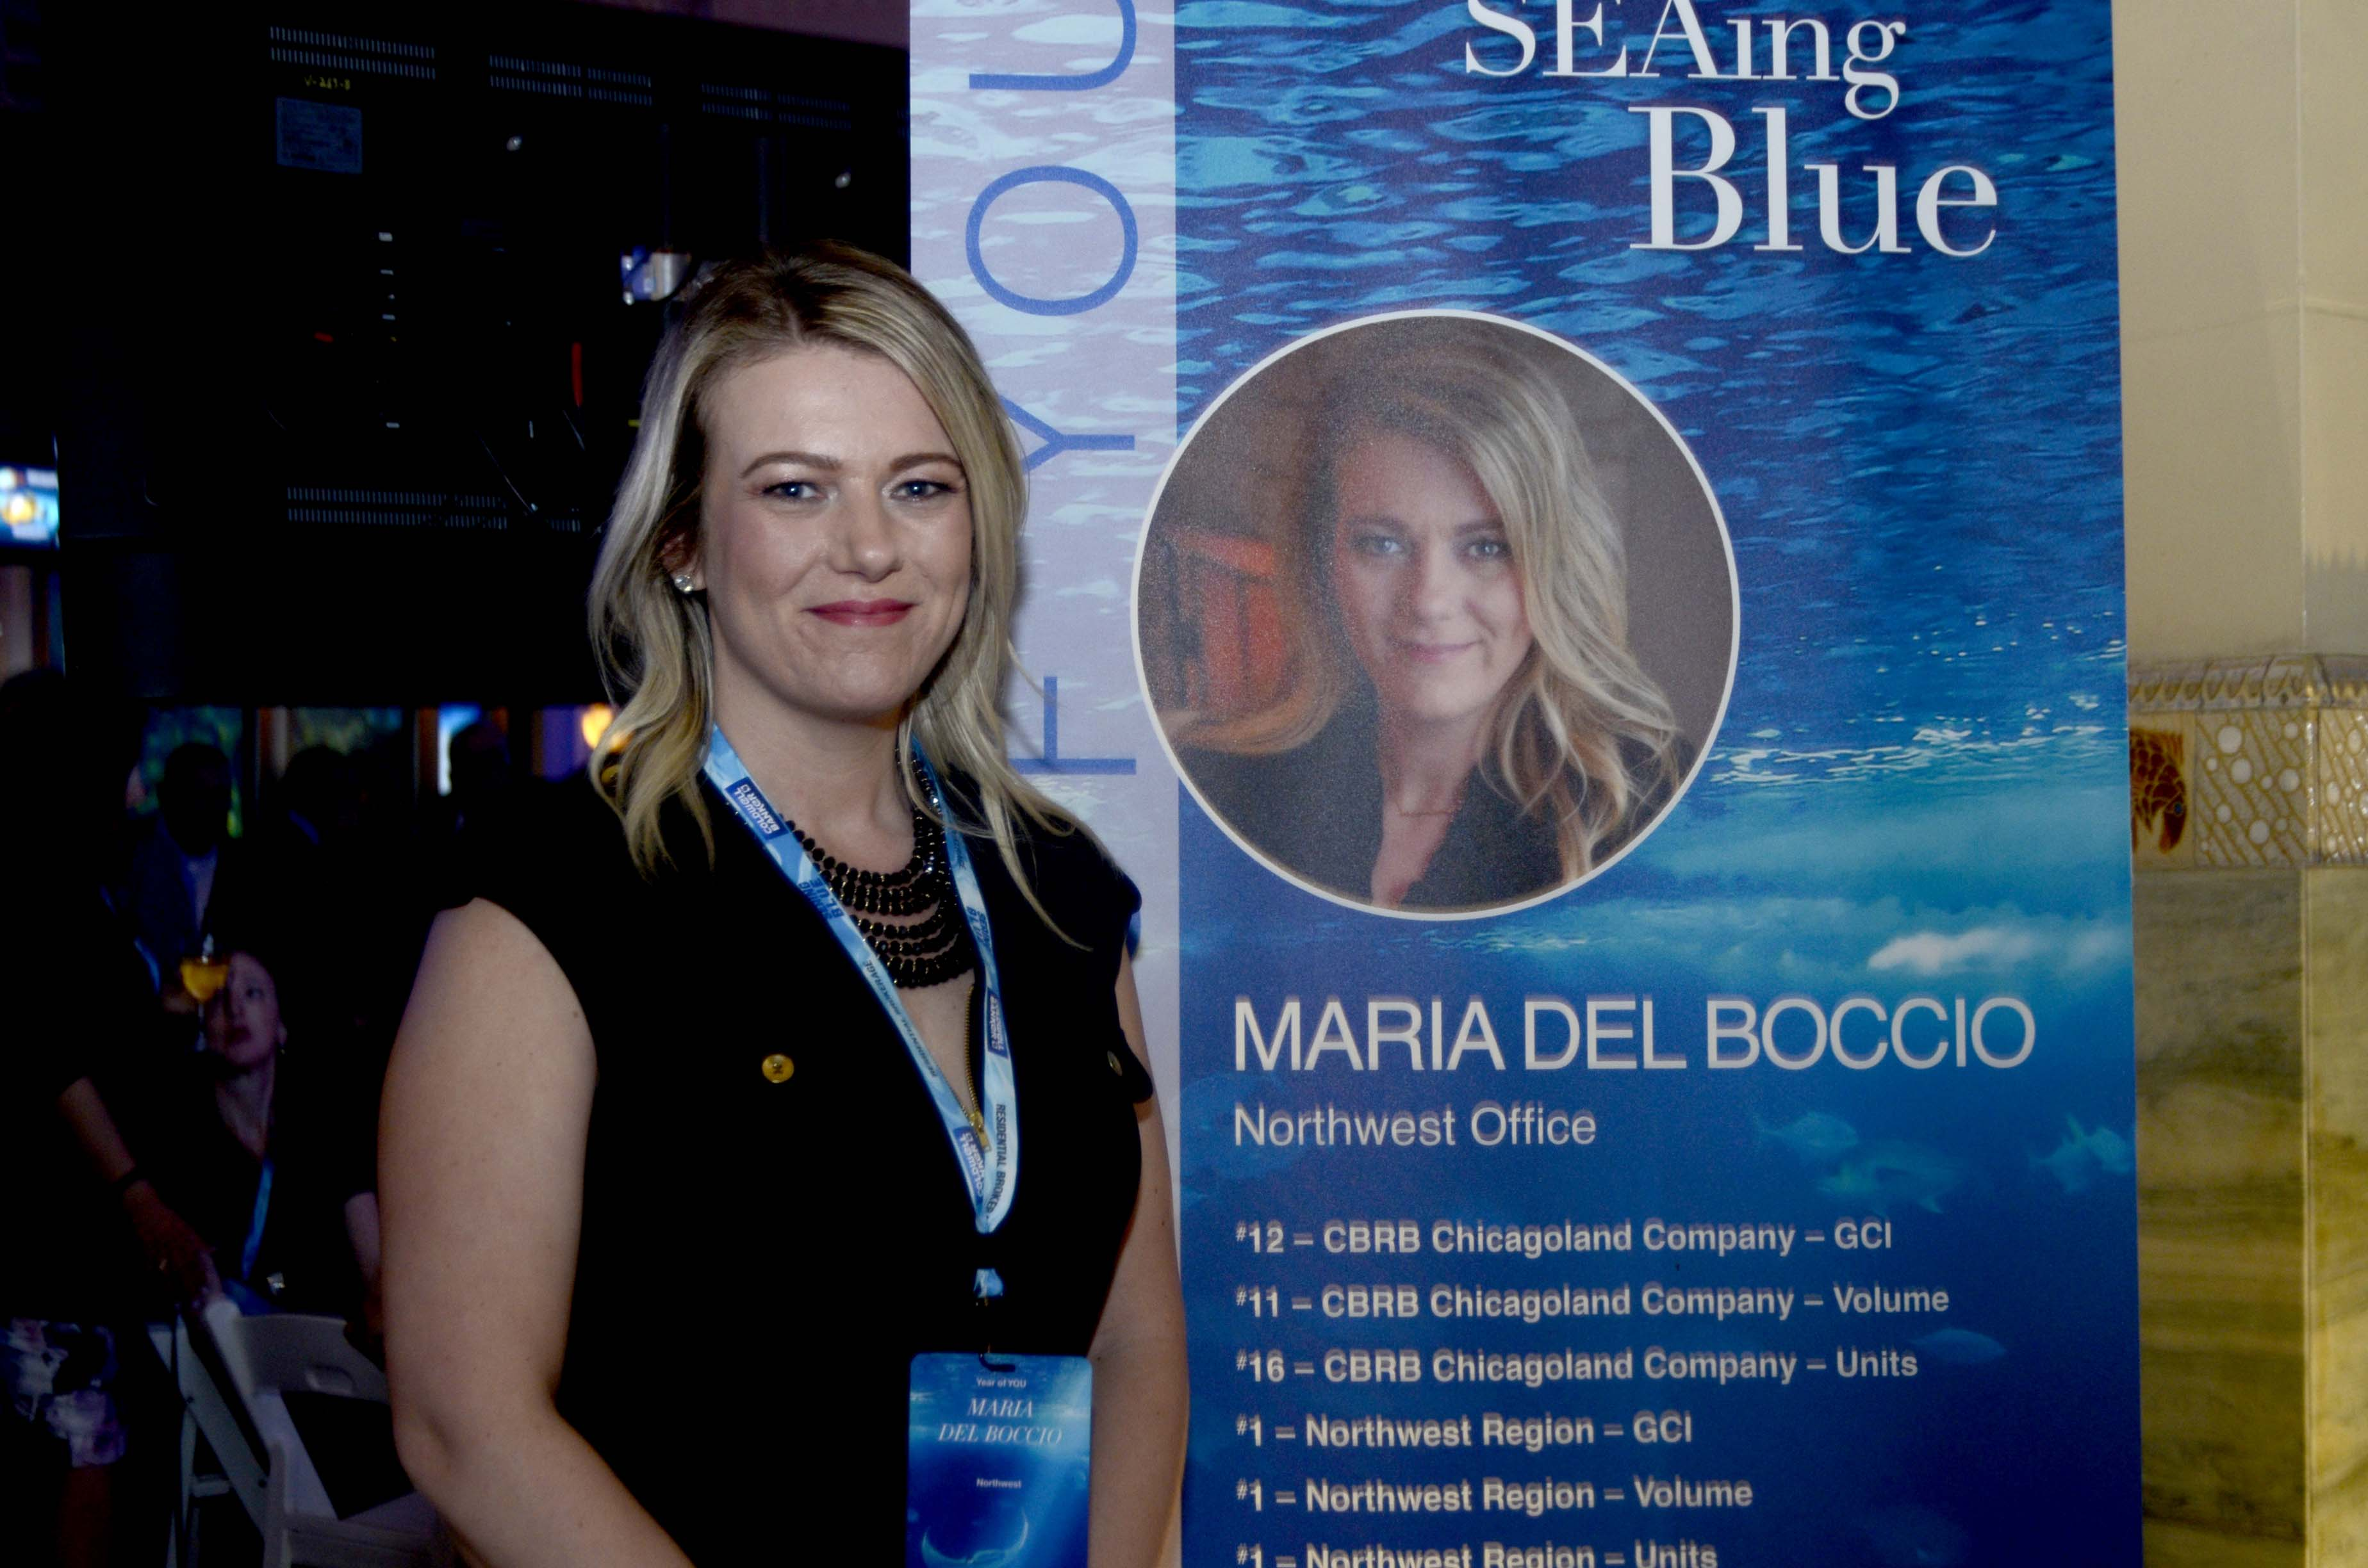 maria-del-boccio-coldwell-banker-northwest-office.jpg